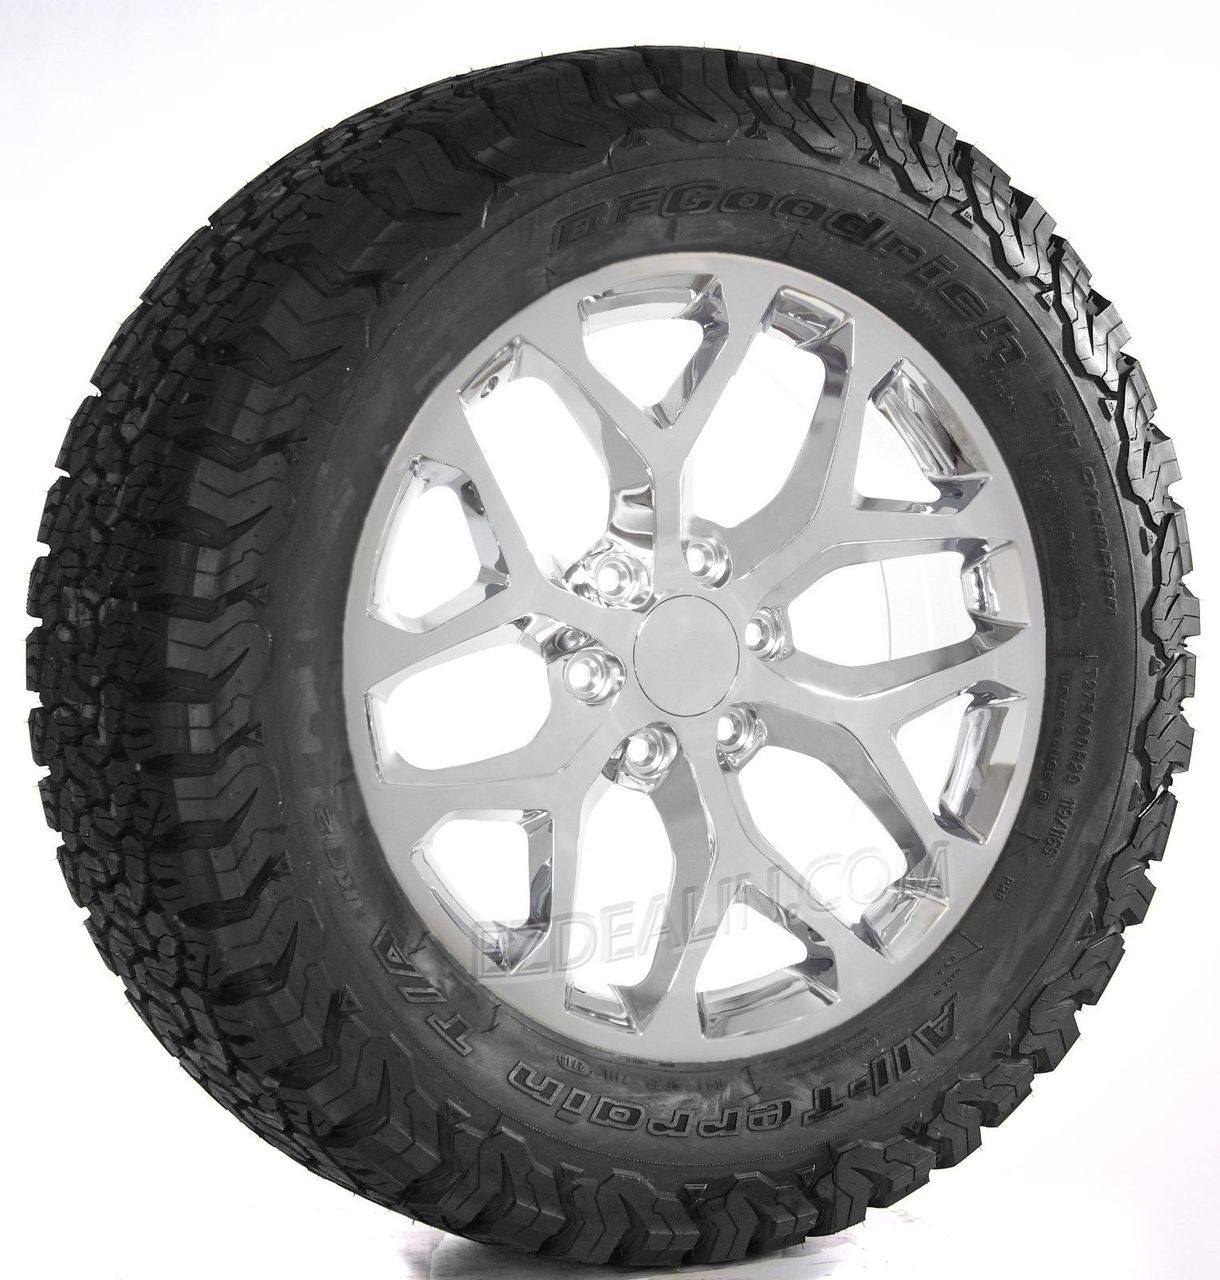 "Snowflake Chrome 20"" Wheels with BFG KO2 A/T Tires for Chevy Silverado, Tahoe, Suburban - New Set of 4"